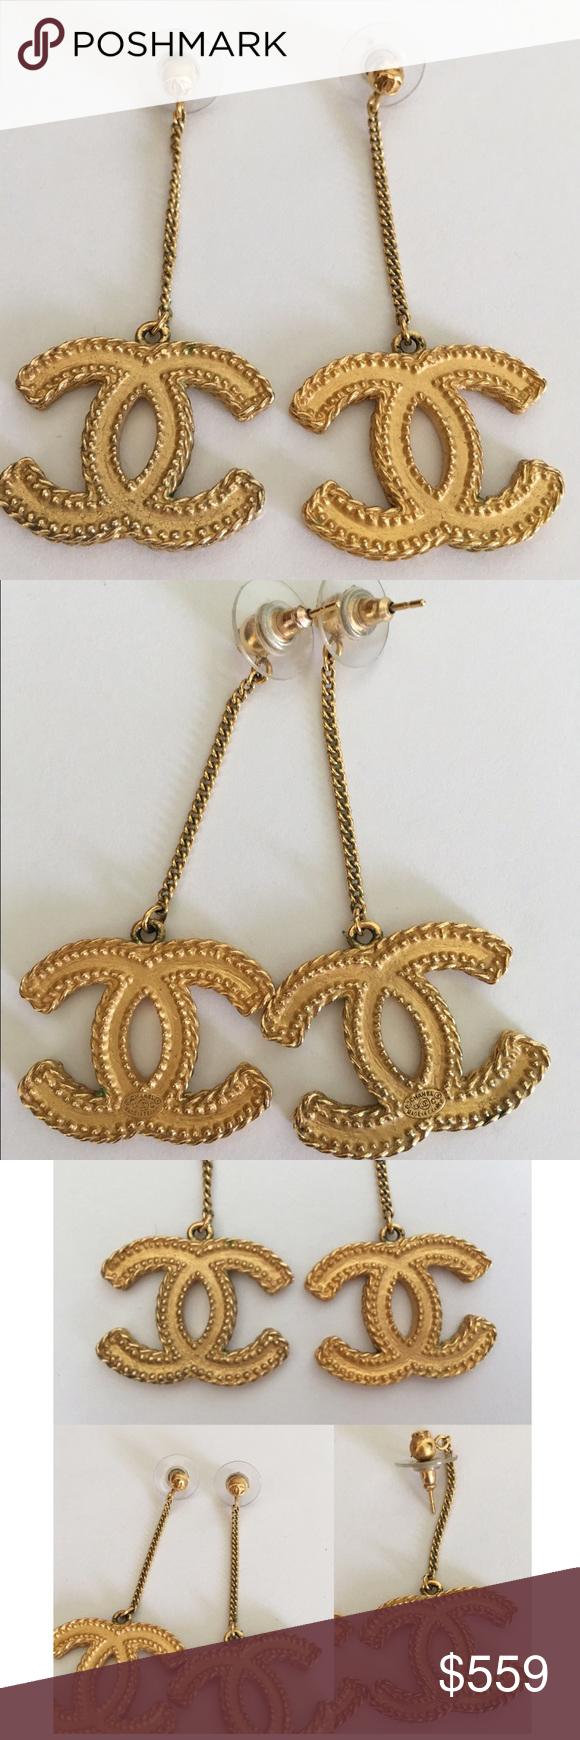 Chanel Cc Drop Earrings Gold Authentic Dangle In Matte Please Note